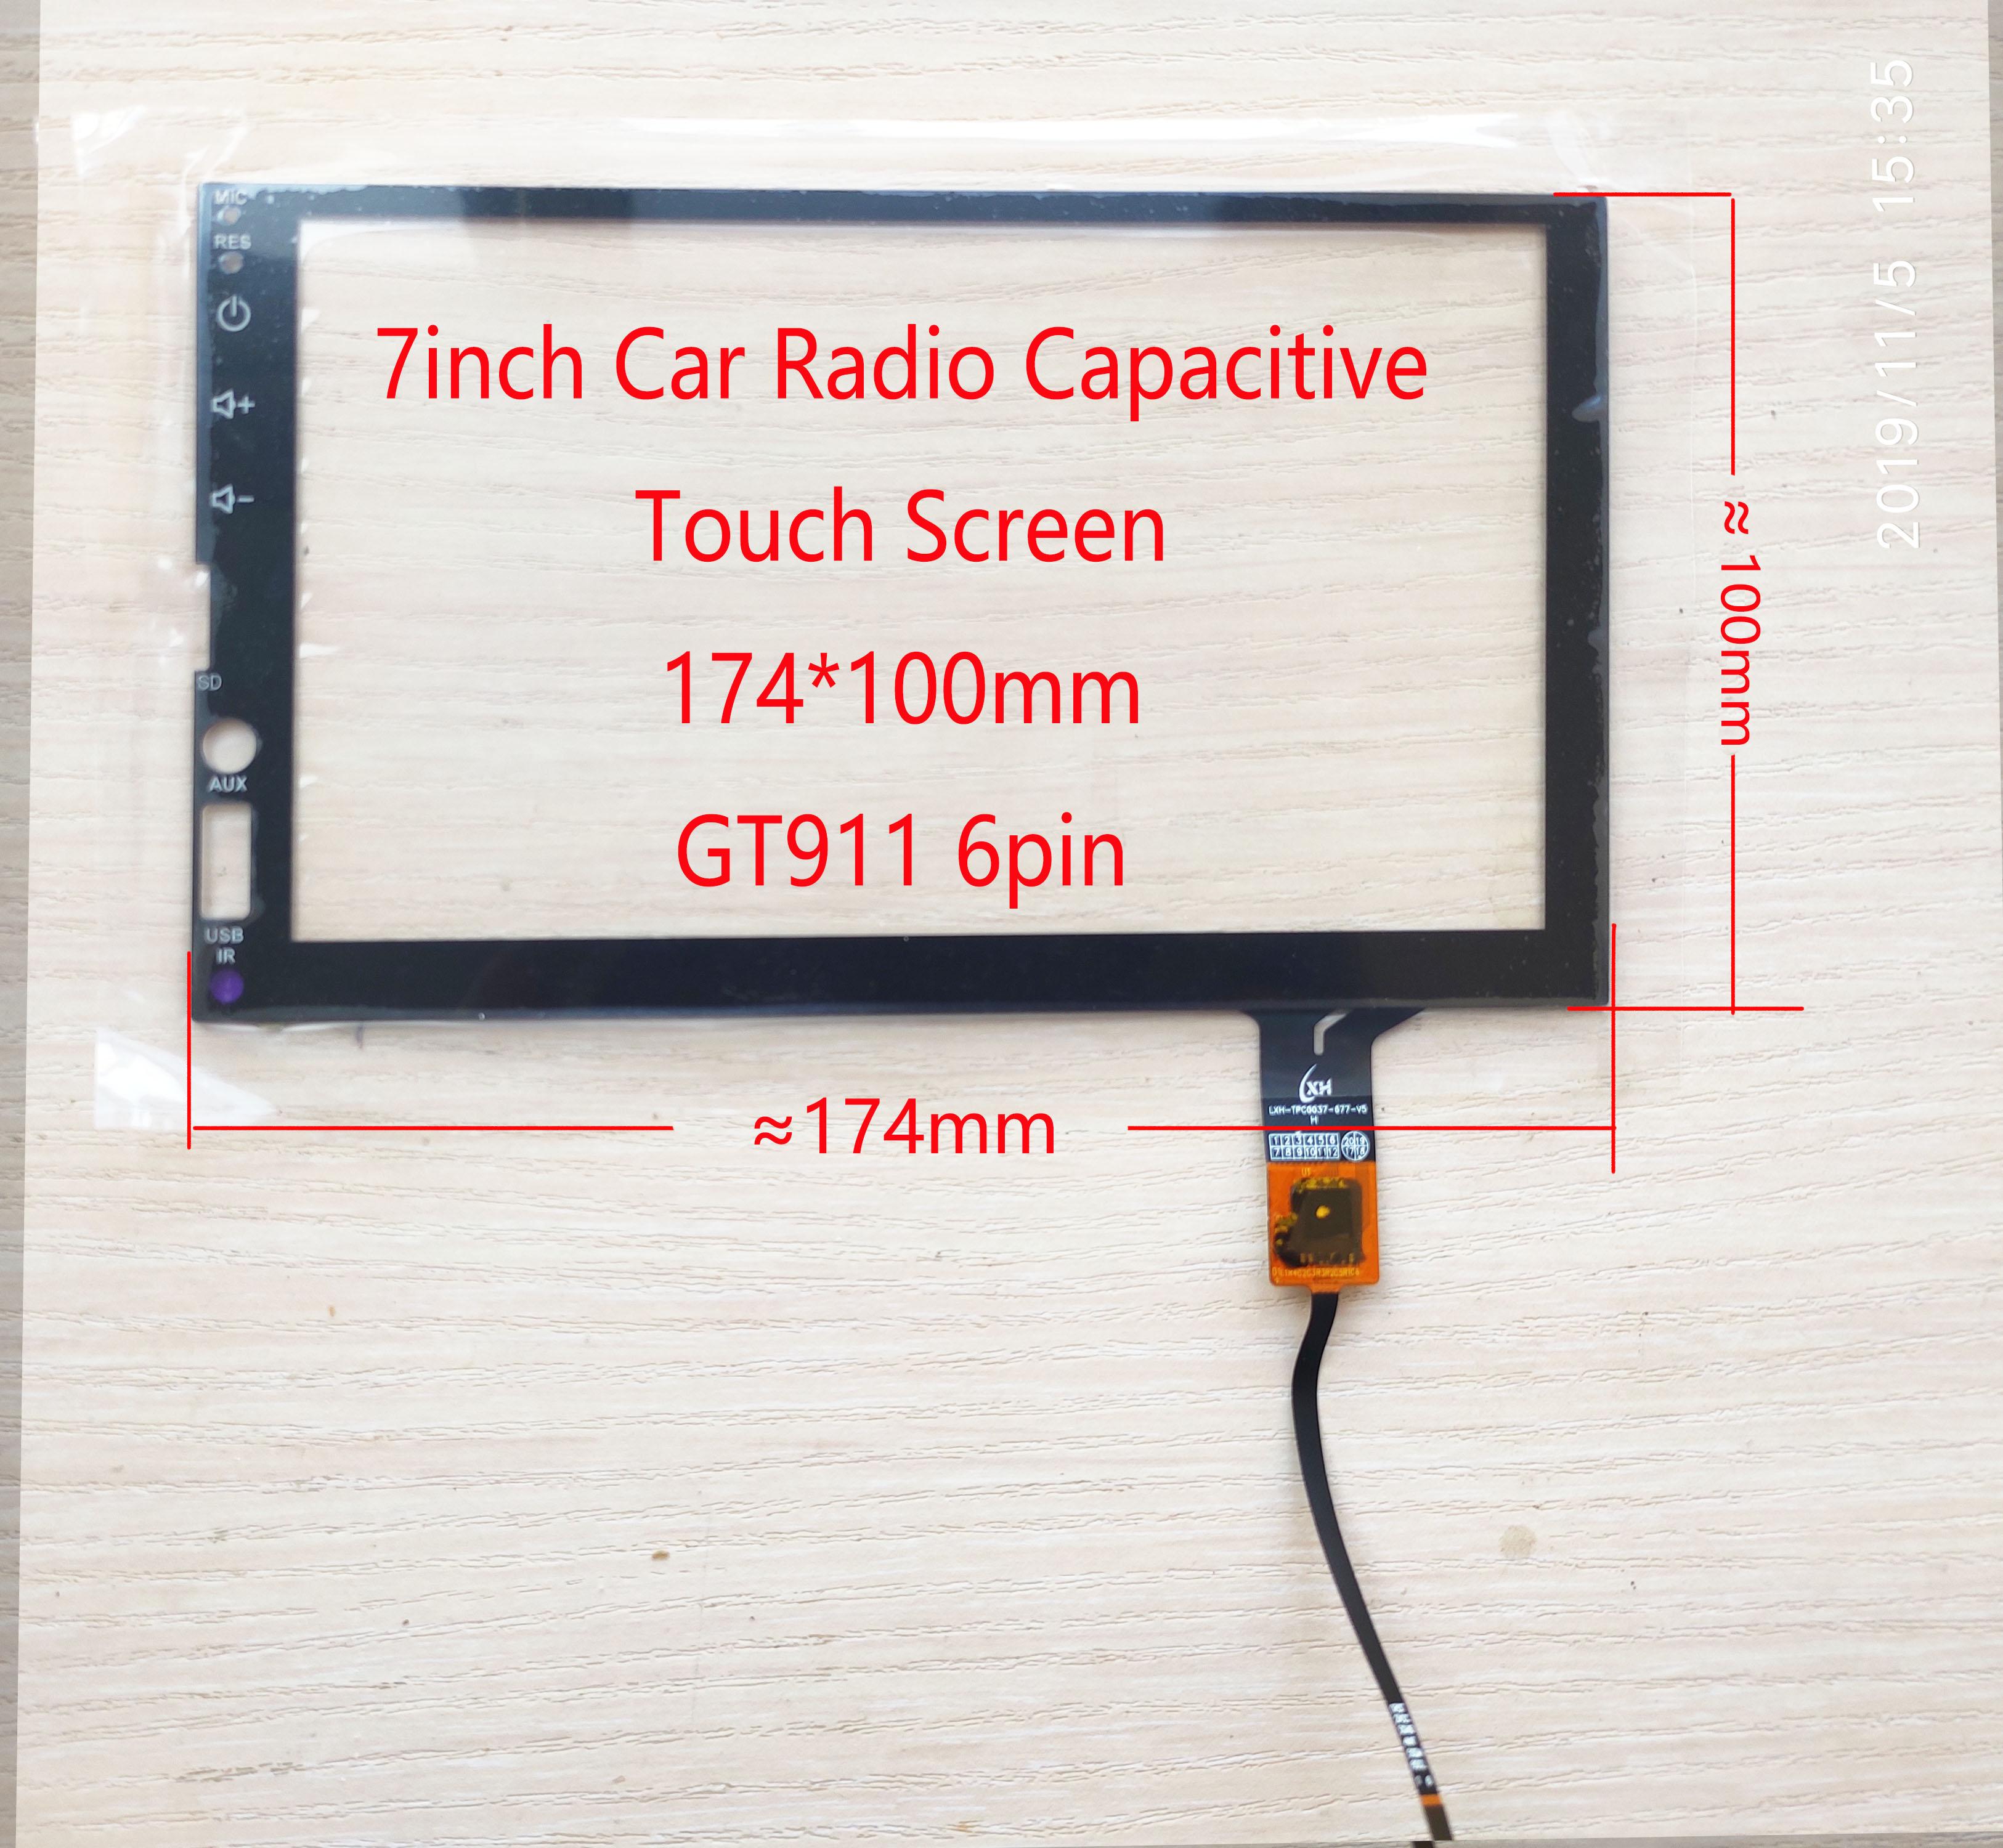 7 inch Car Radio/PC Capacitive Touch Screen  174*100mm GT911 6pin universal LXH-TPC0037-677-V5